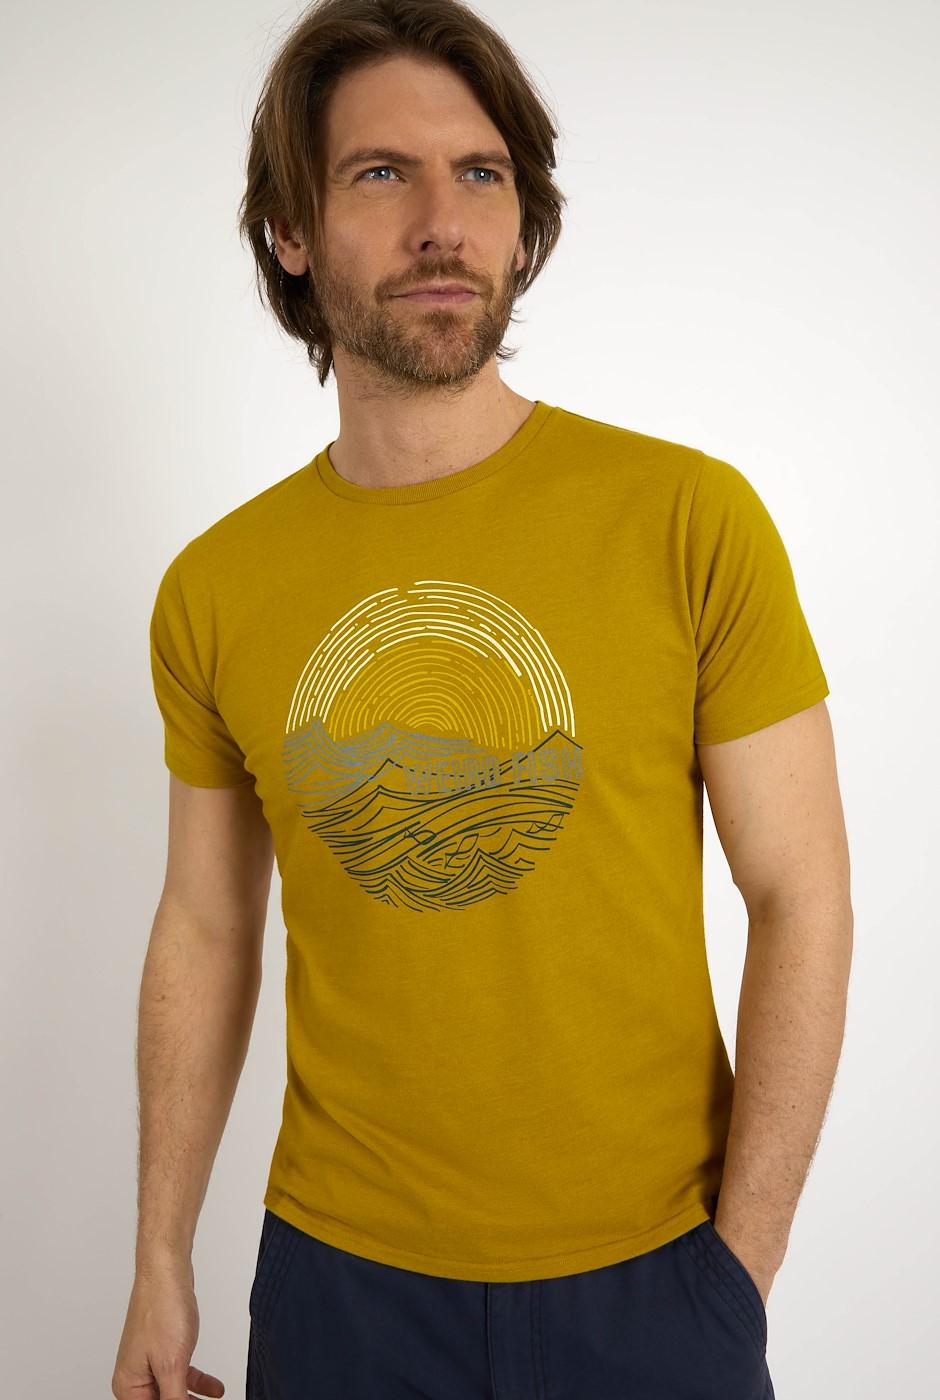 Ocean Organic Cotton Graphic T-Shirt Mustard